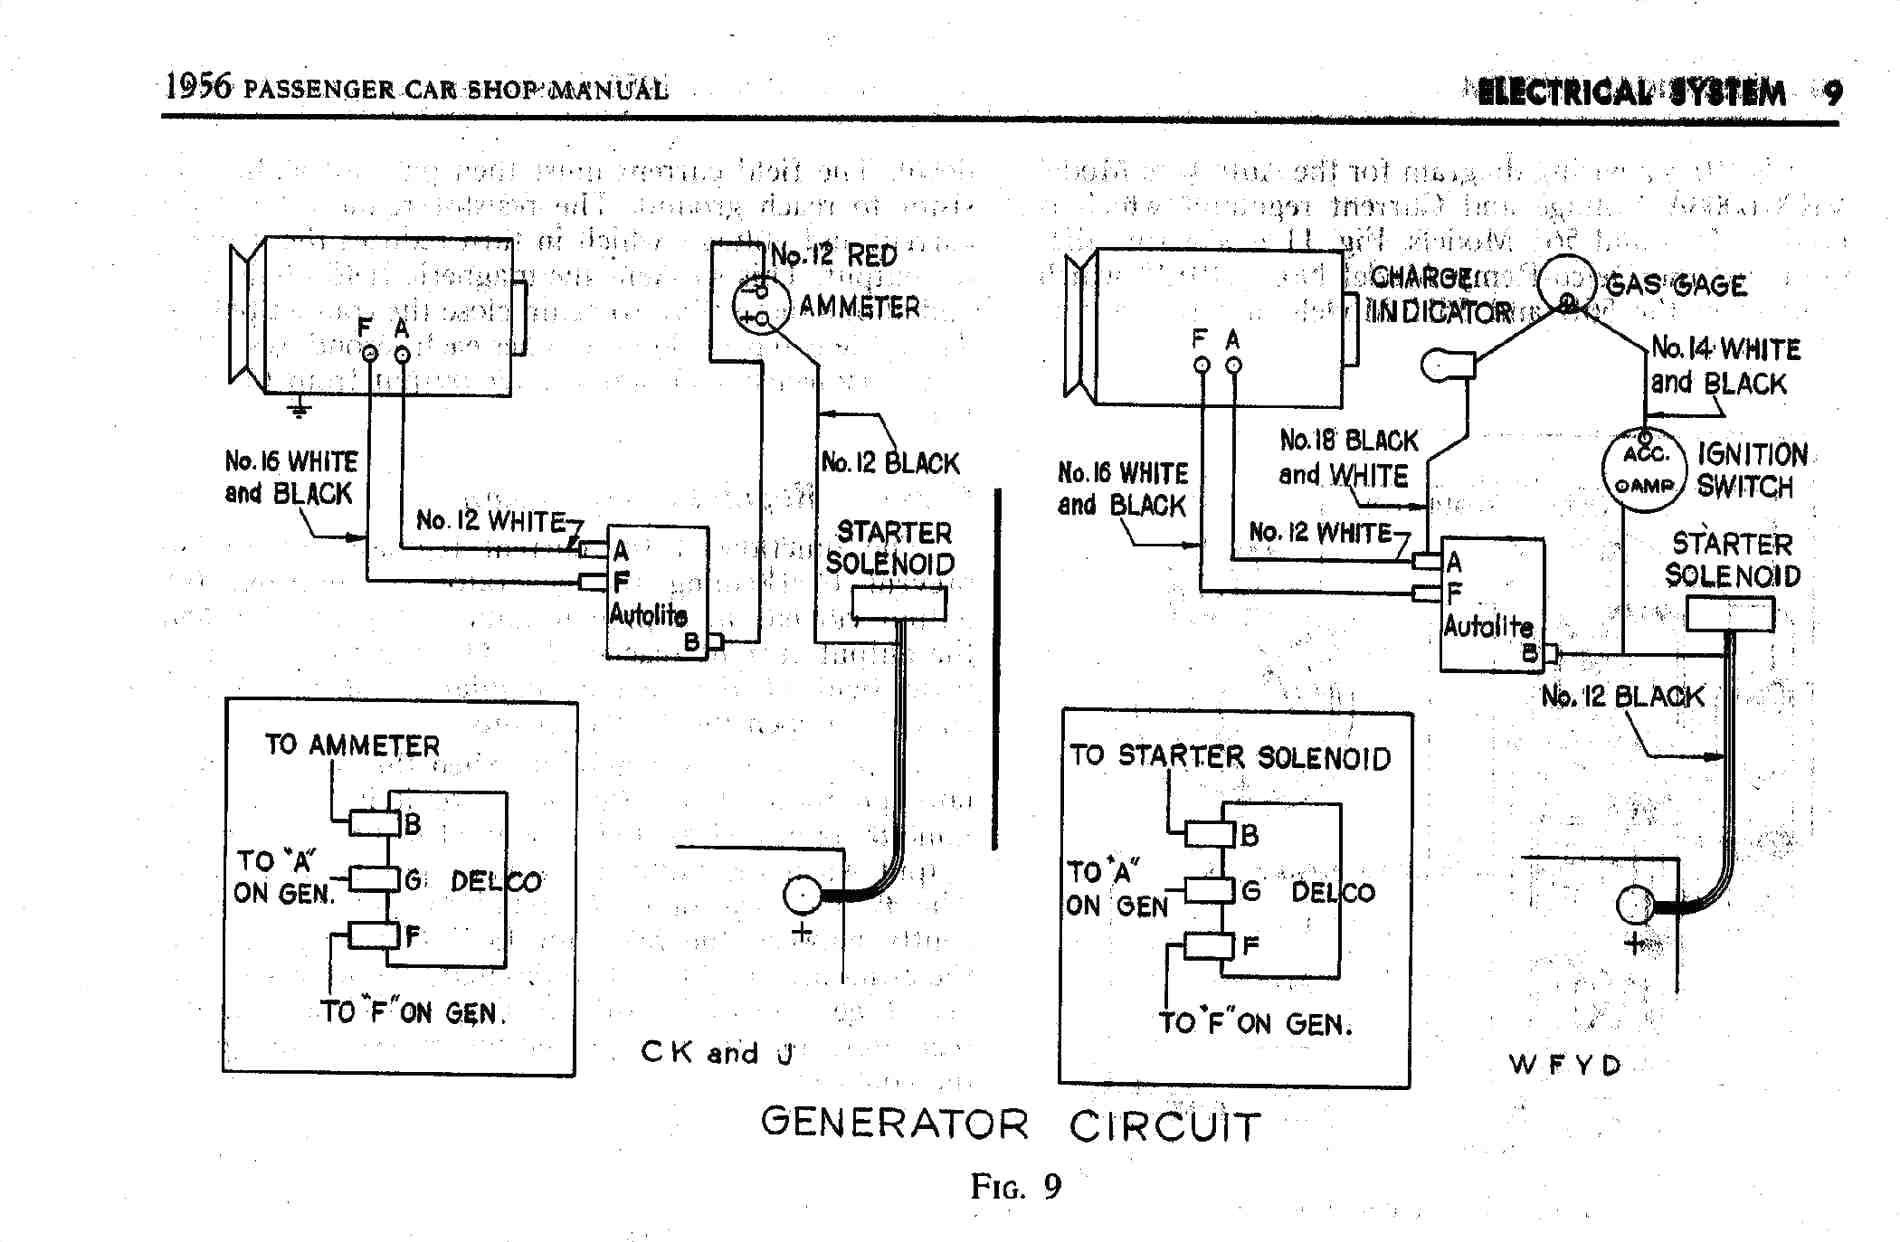 Spitronics Engine Management Wiring Diagram